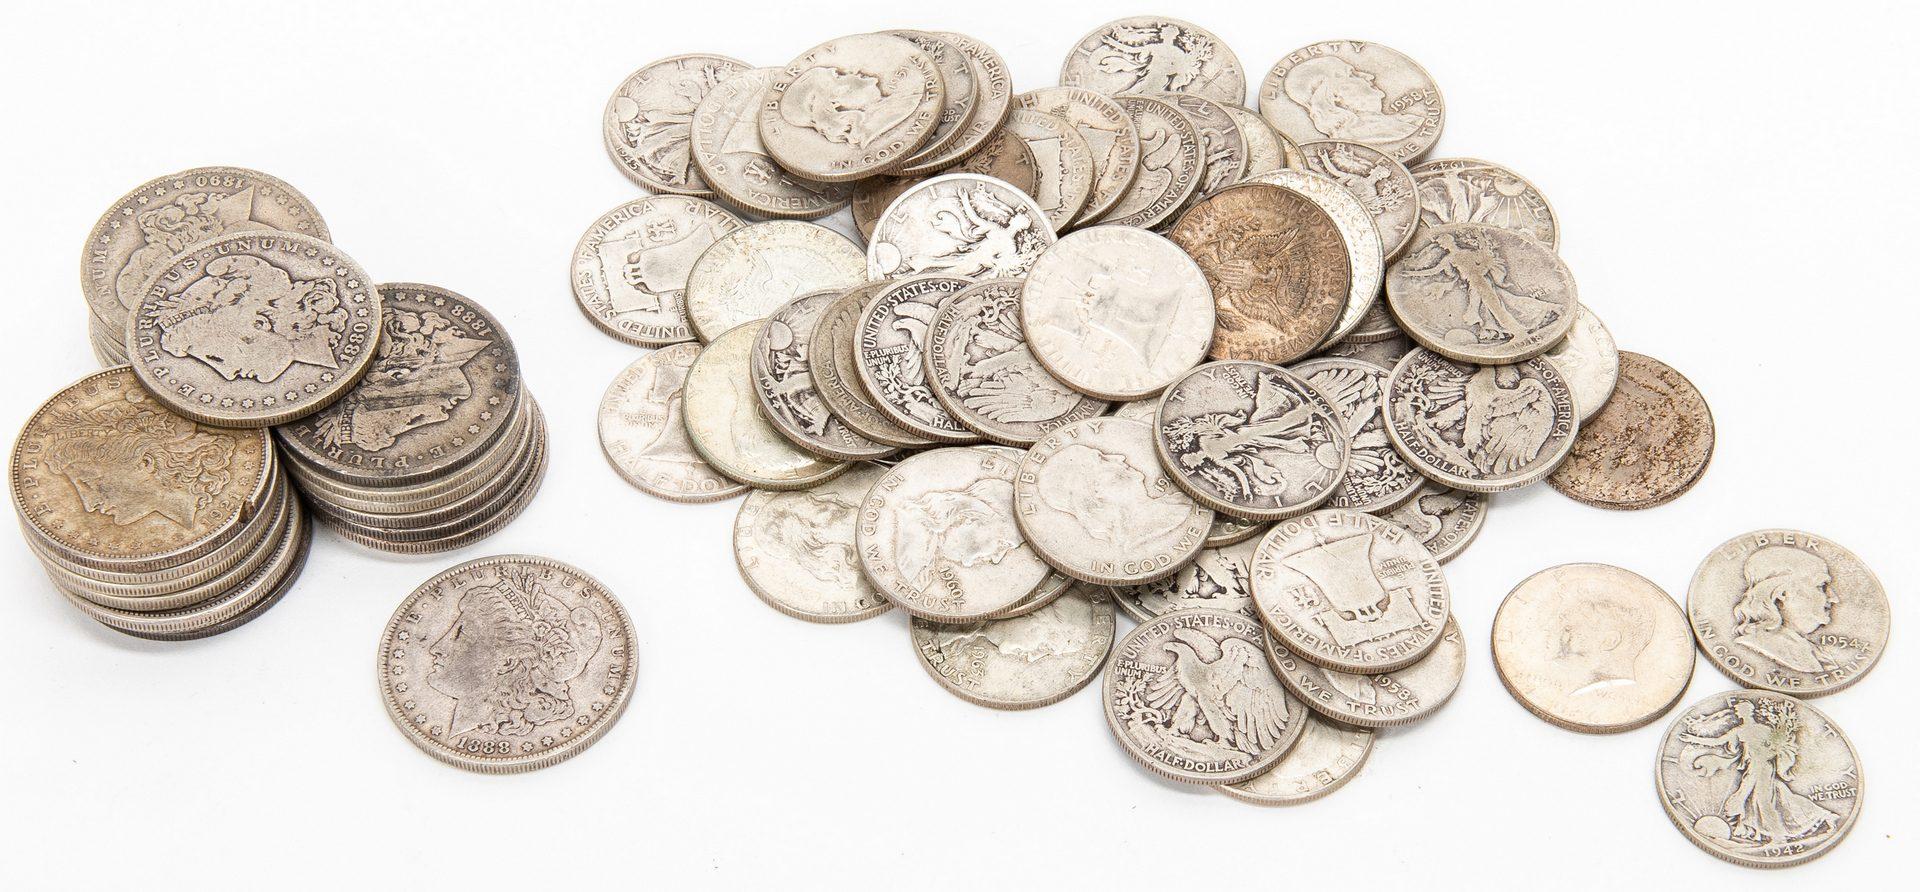 Lot 804: 23 Morgan, 25 Walking Liberty, 25 Franklin, 7 Kennedy Silver Dollars/Half Dollars